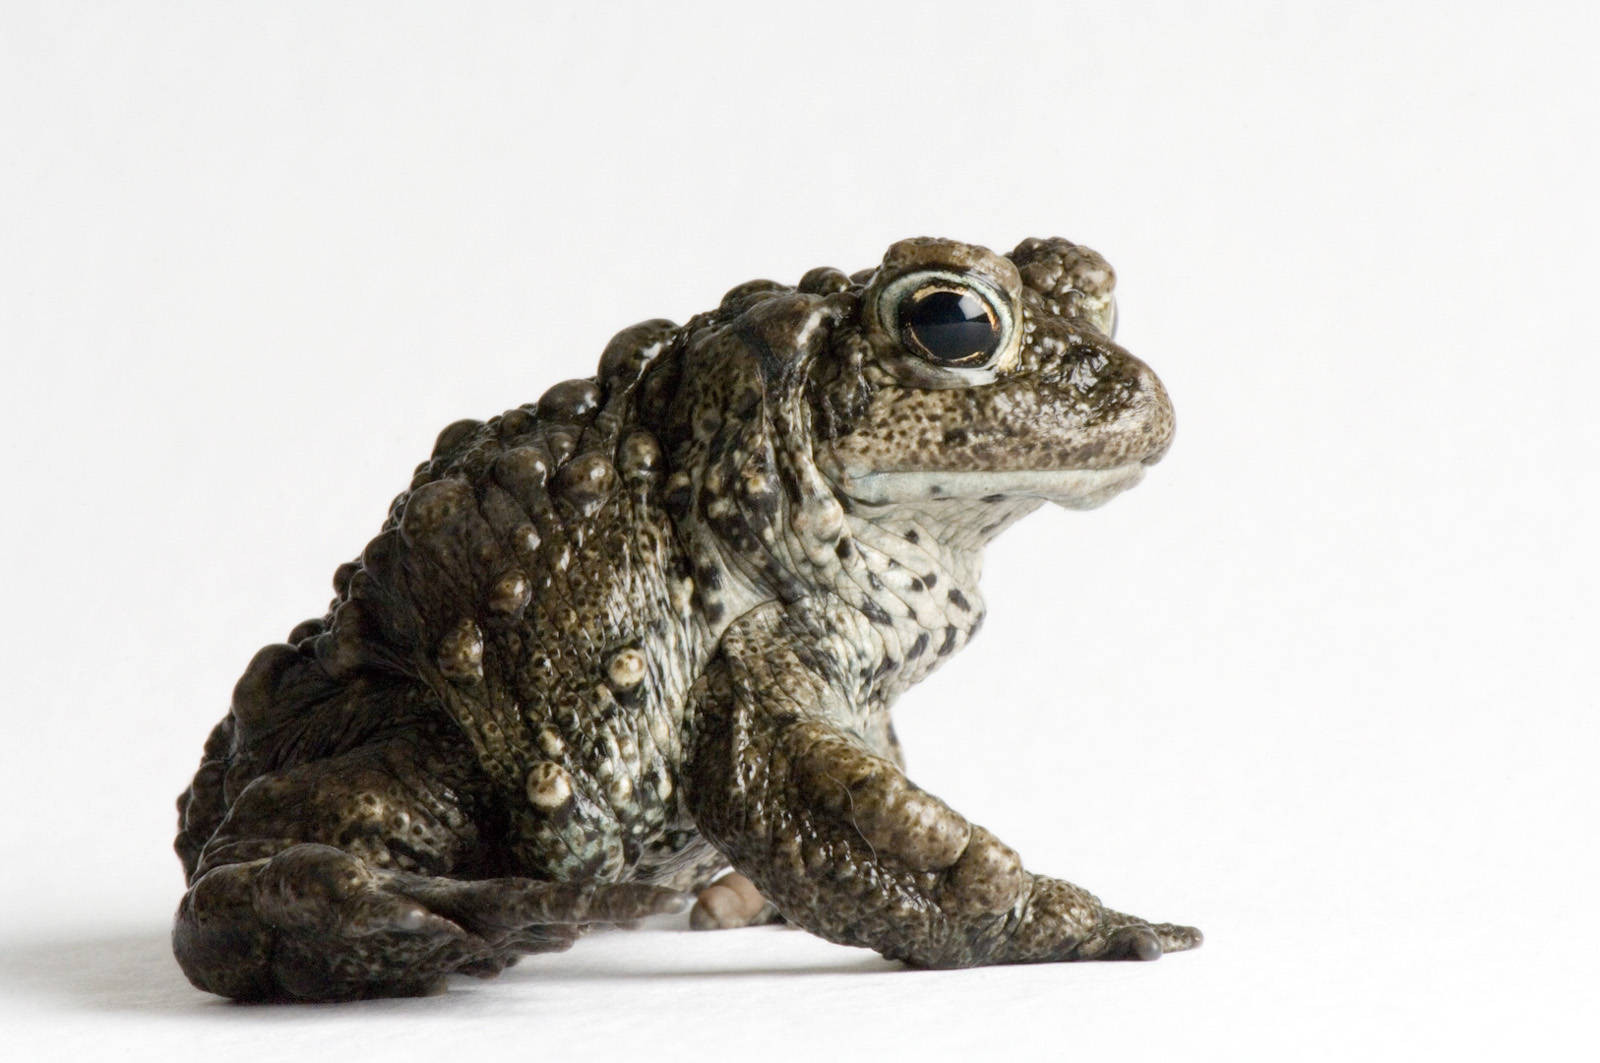 Ani025 00178 joel sartore a boreal toad anaxyrus boreas boreas at the cheyenne mountain zoo sciox Image collections